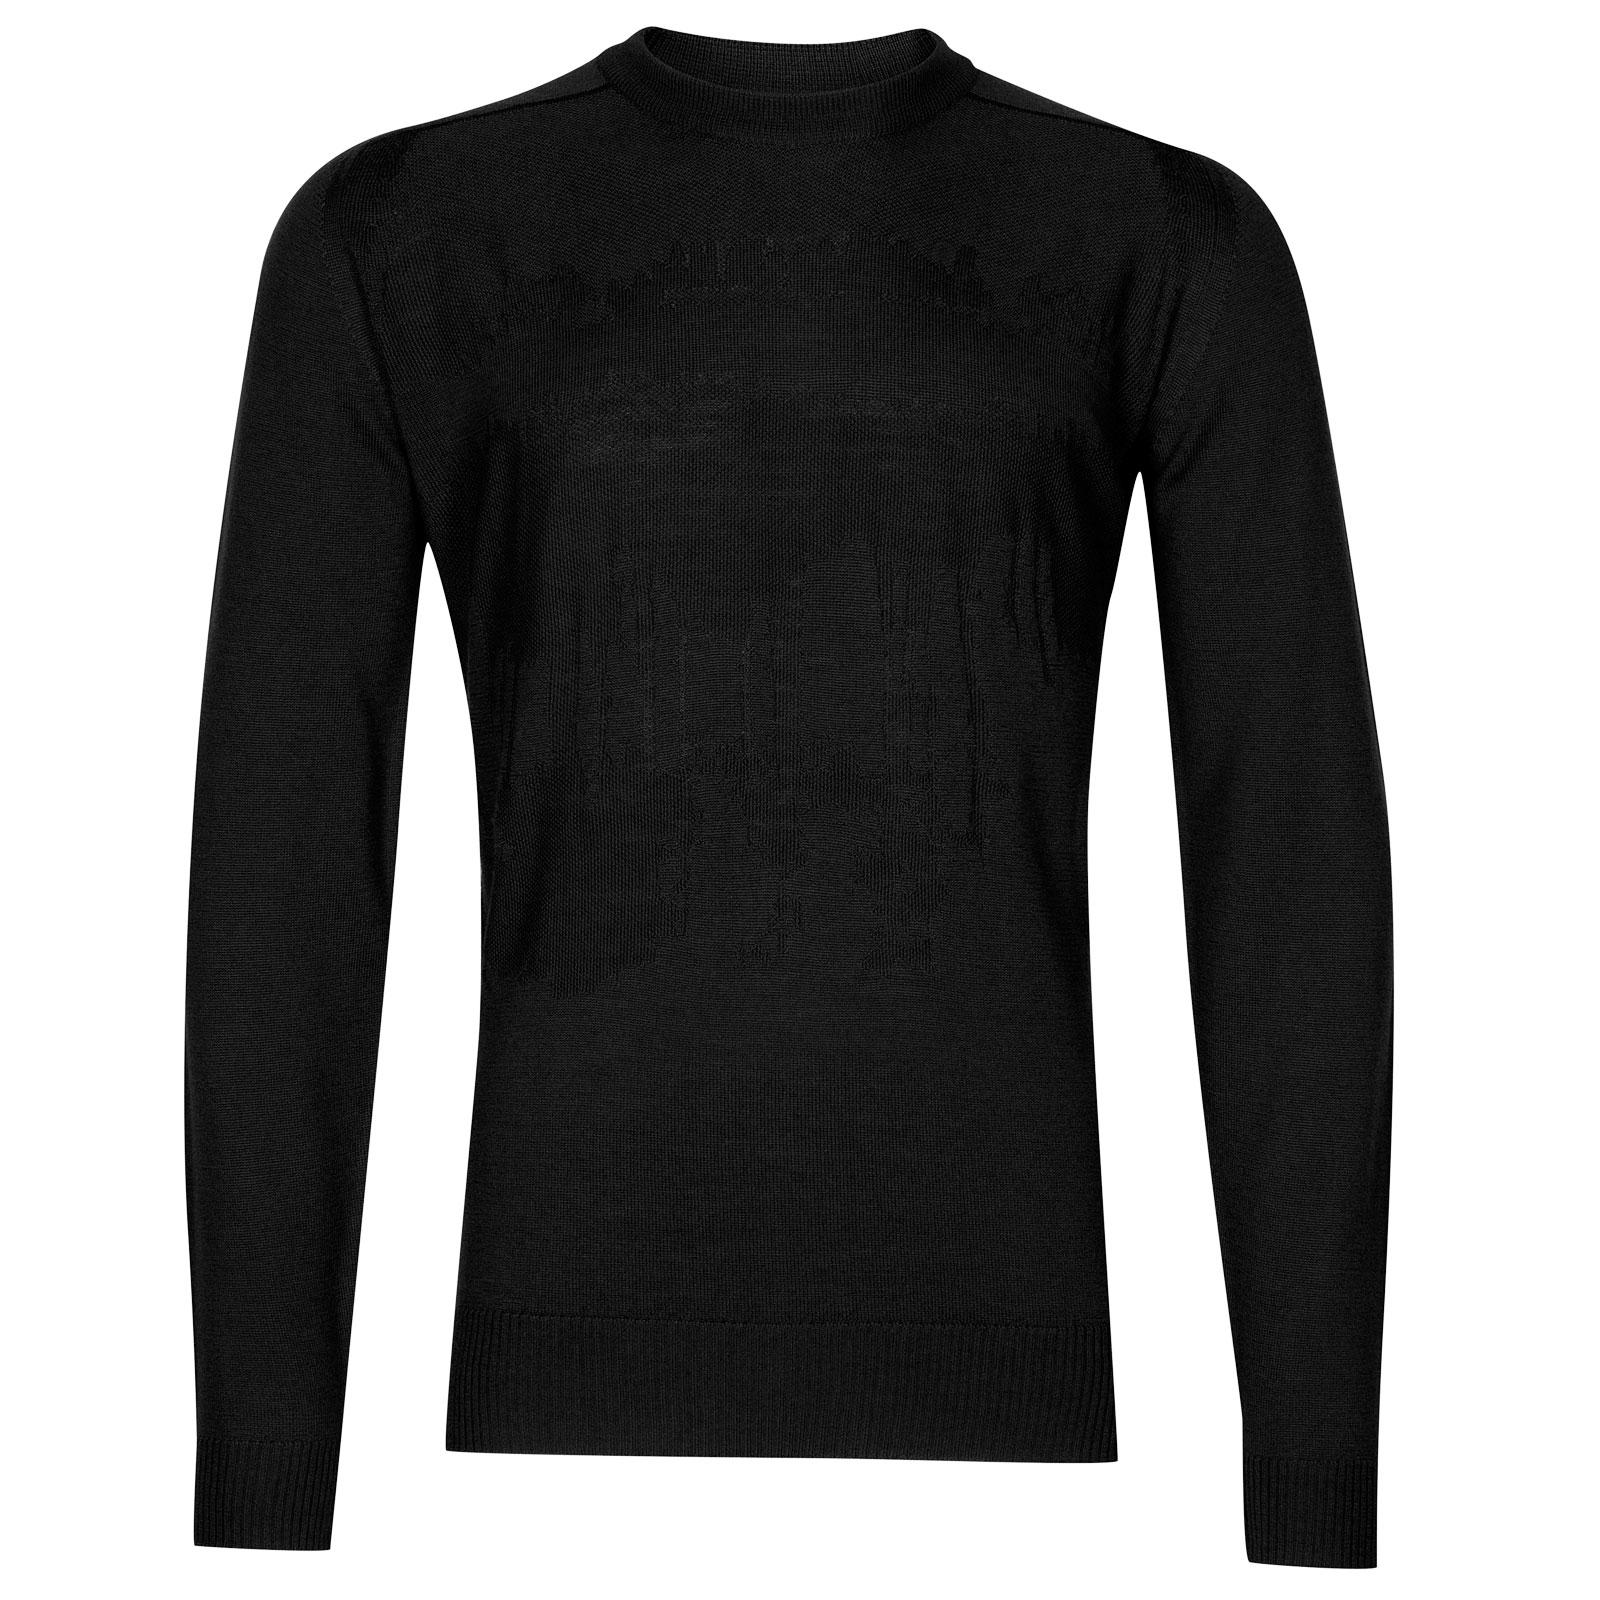 John Smedley sorbus Merino Wool Pullover in Black-L